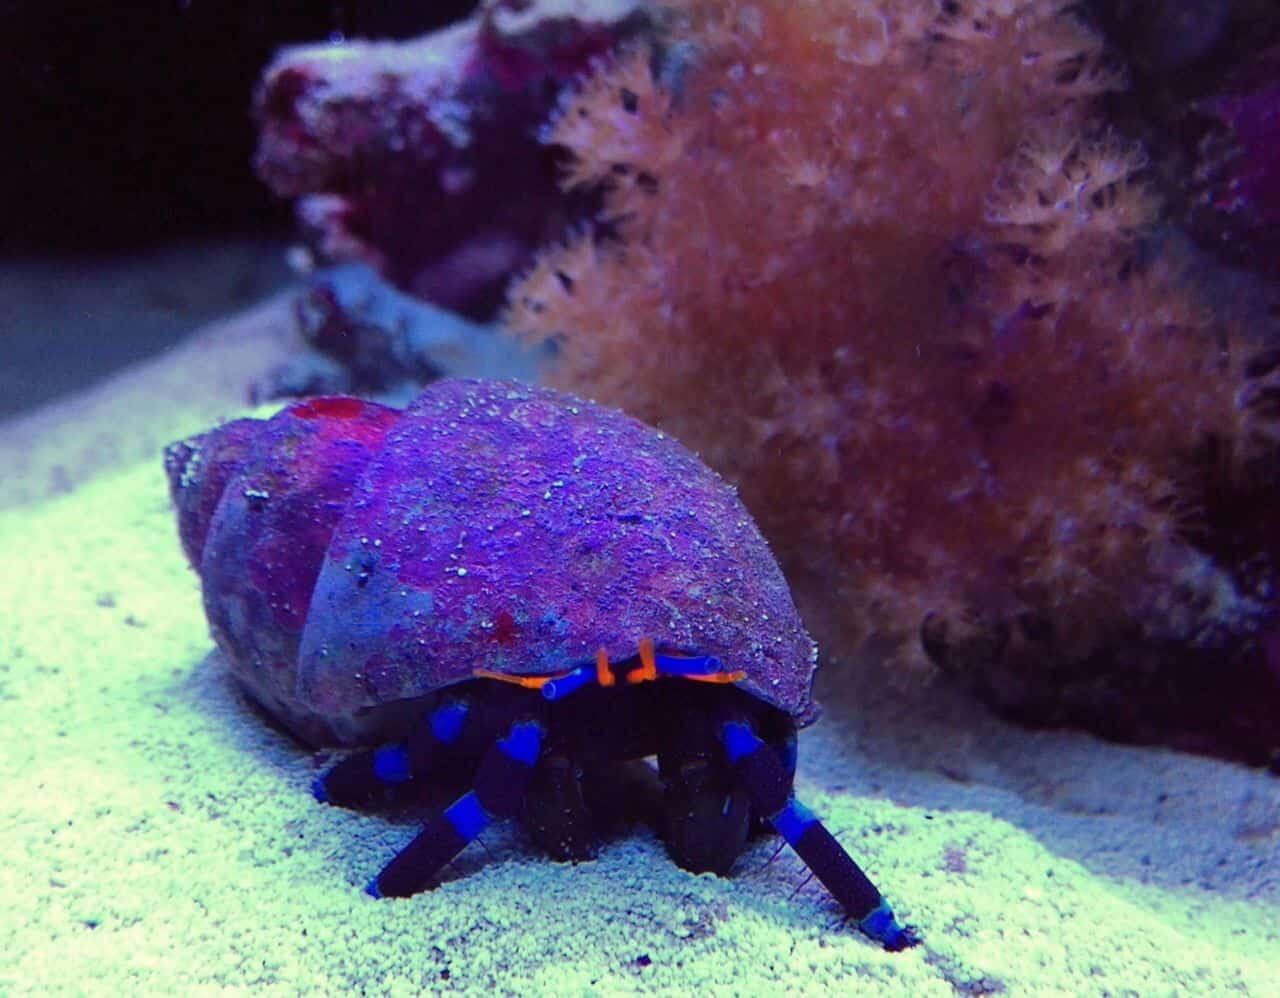 Podcast Episode #138: Einsiedlerkrebse im Meerwasseraquarium (Markus Mahl) 2